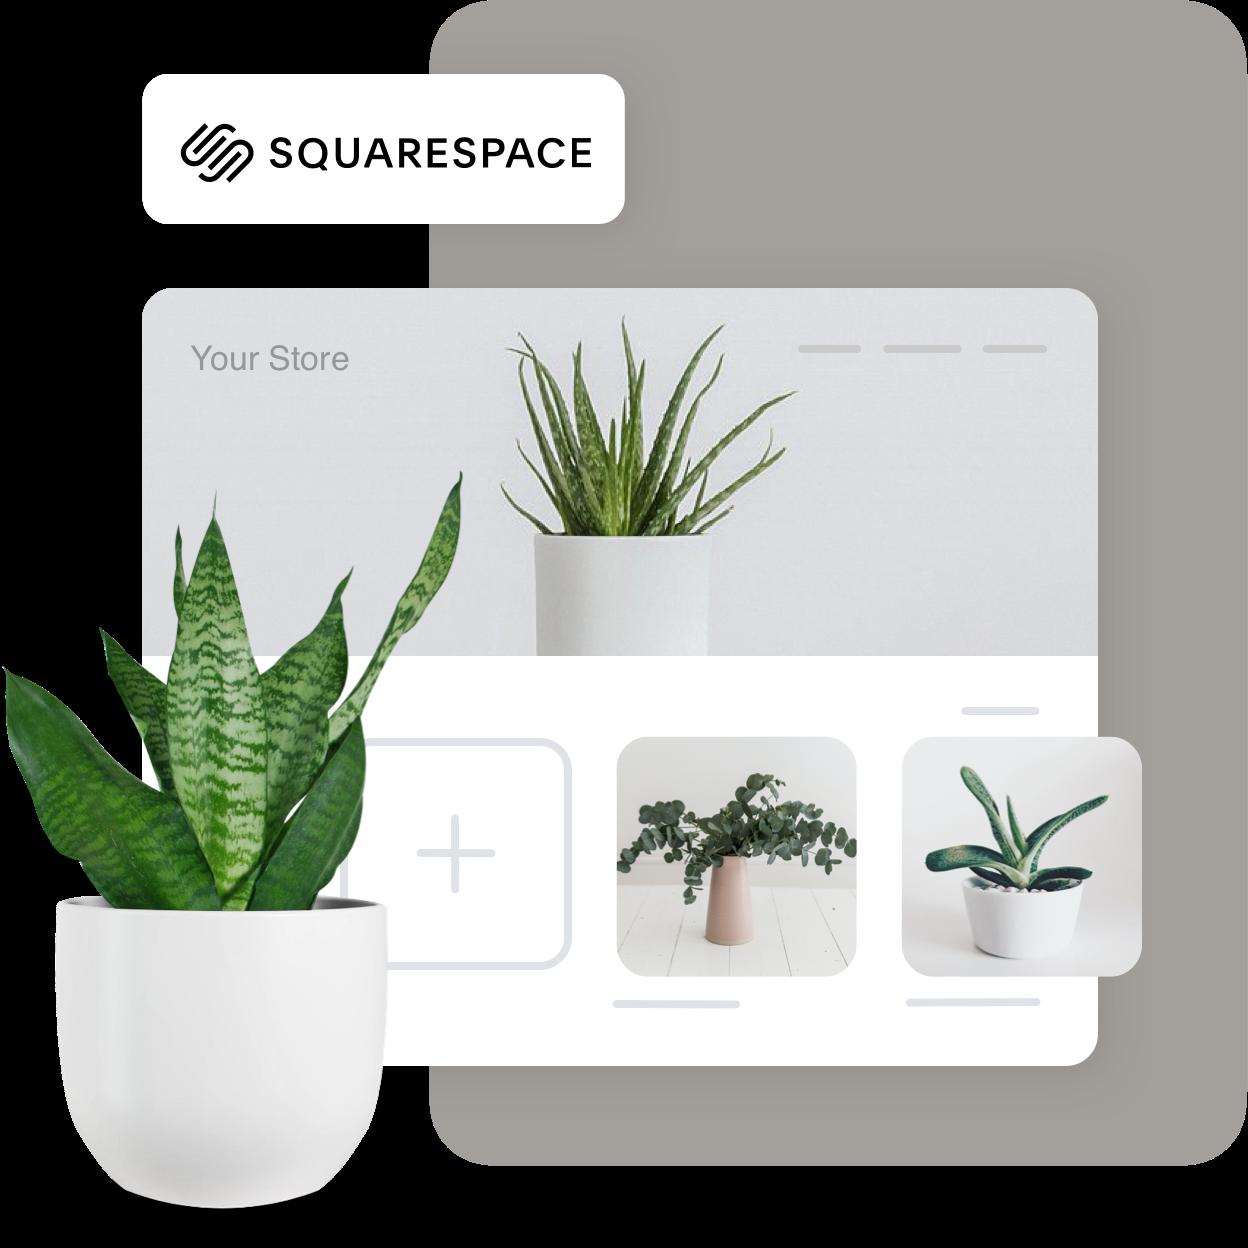 Squarespace_Main-1619683726-1619768429